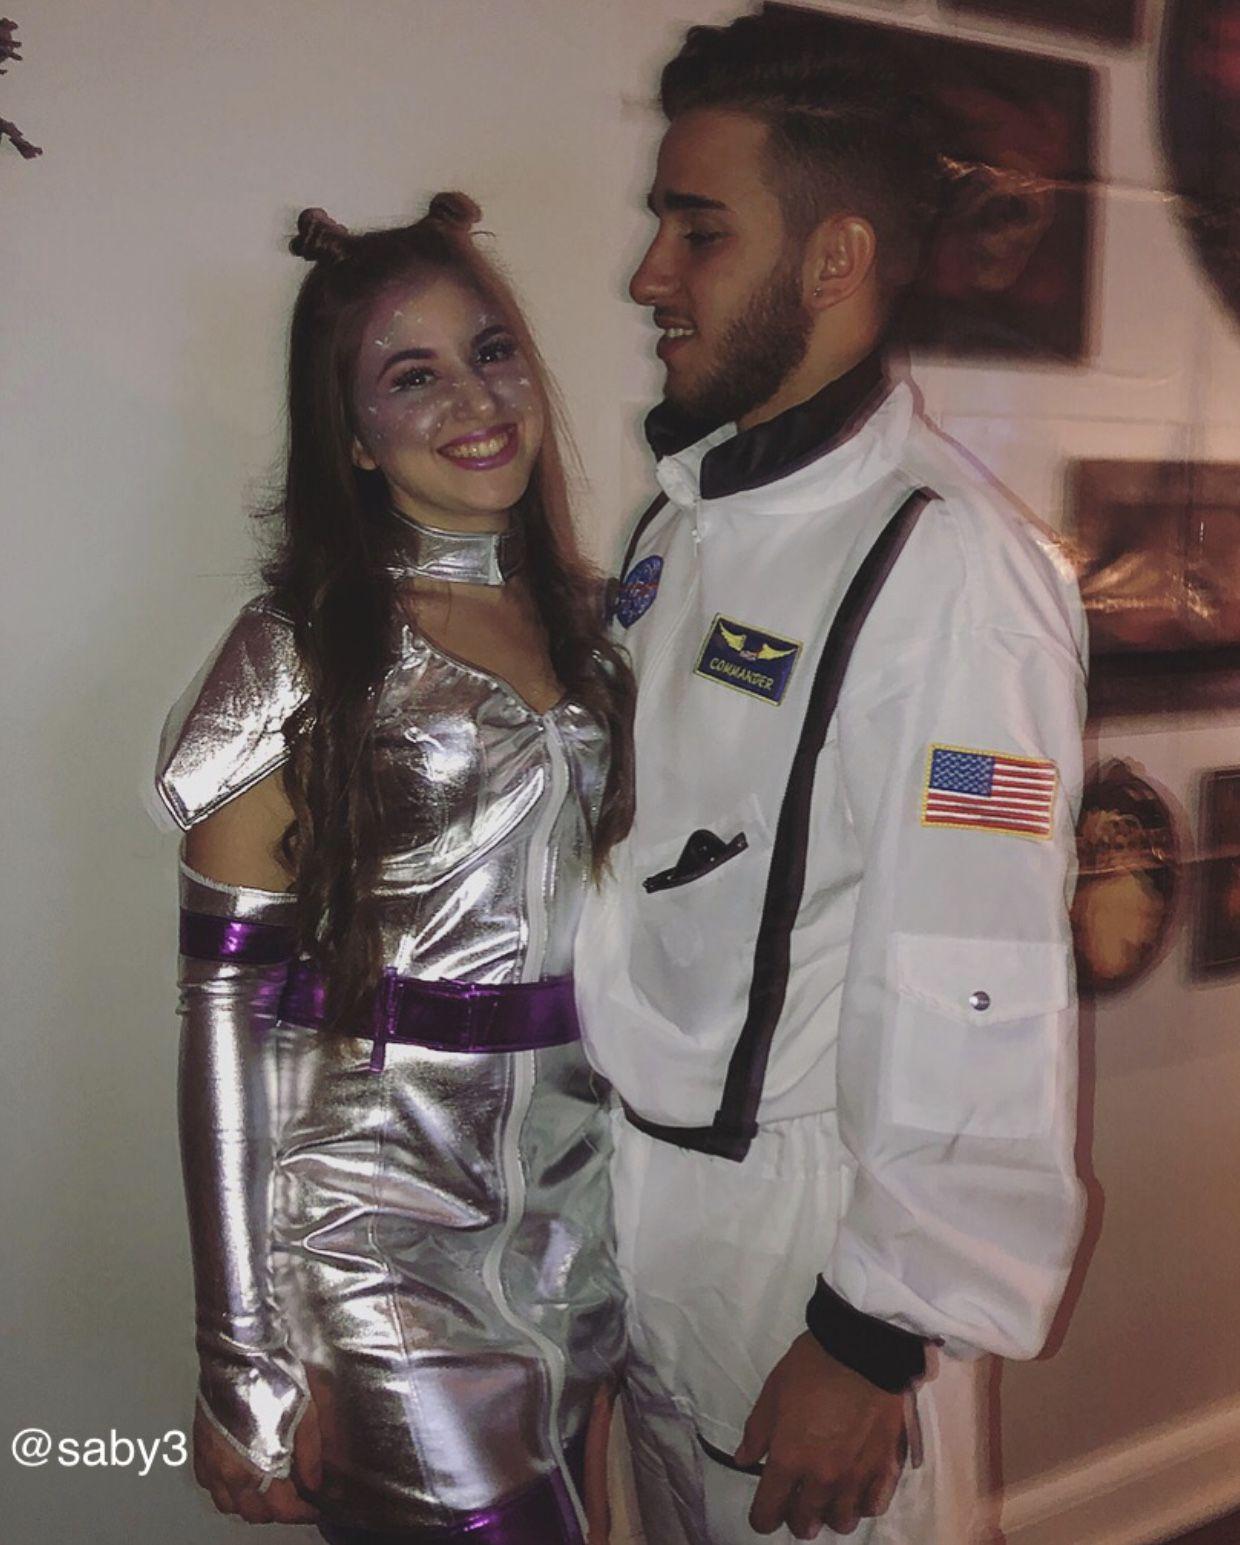 Halloween Astronaut Costume